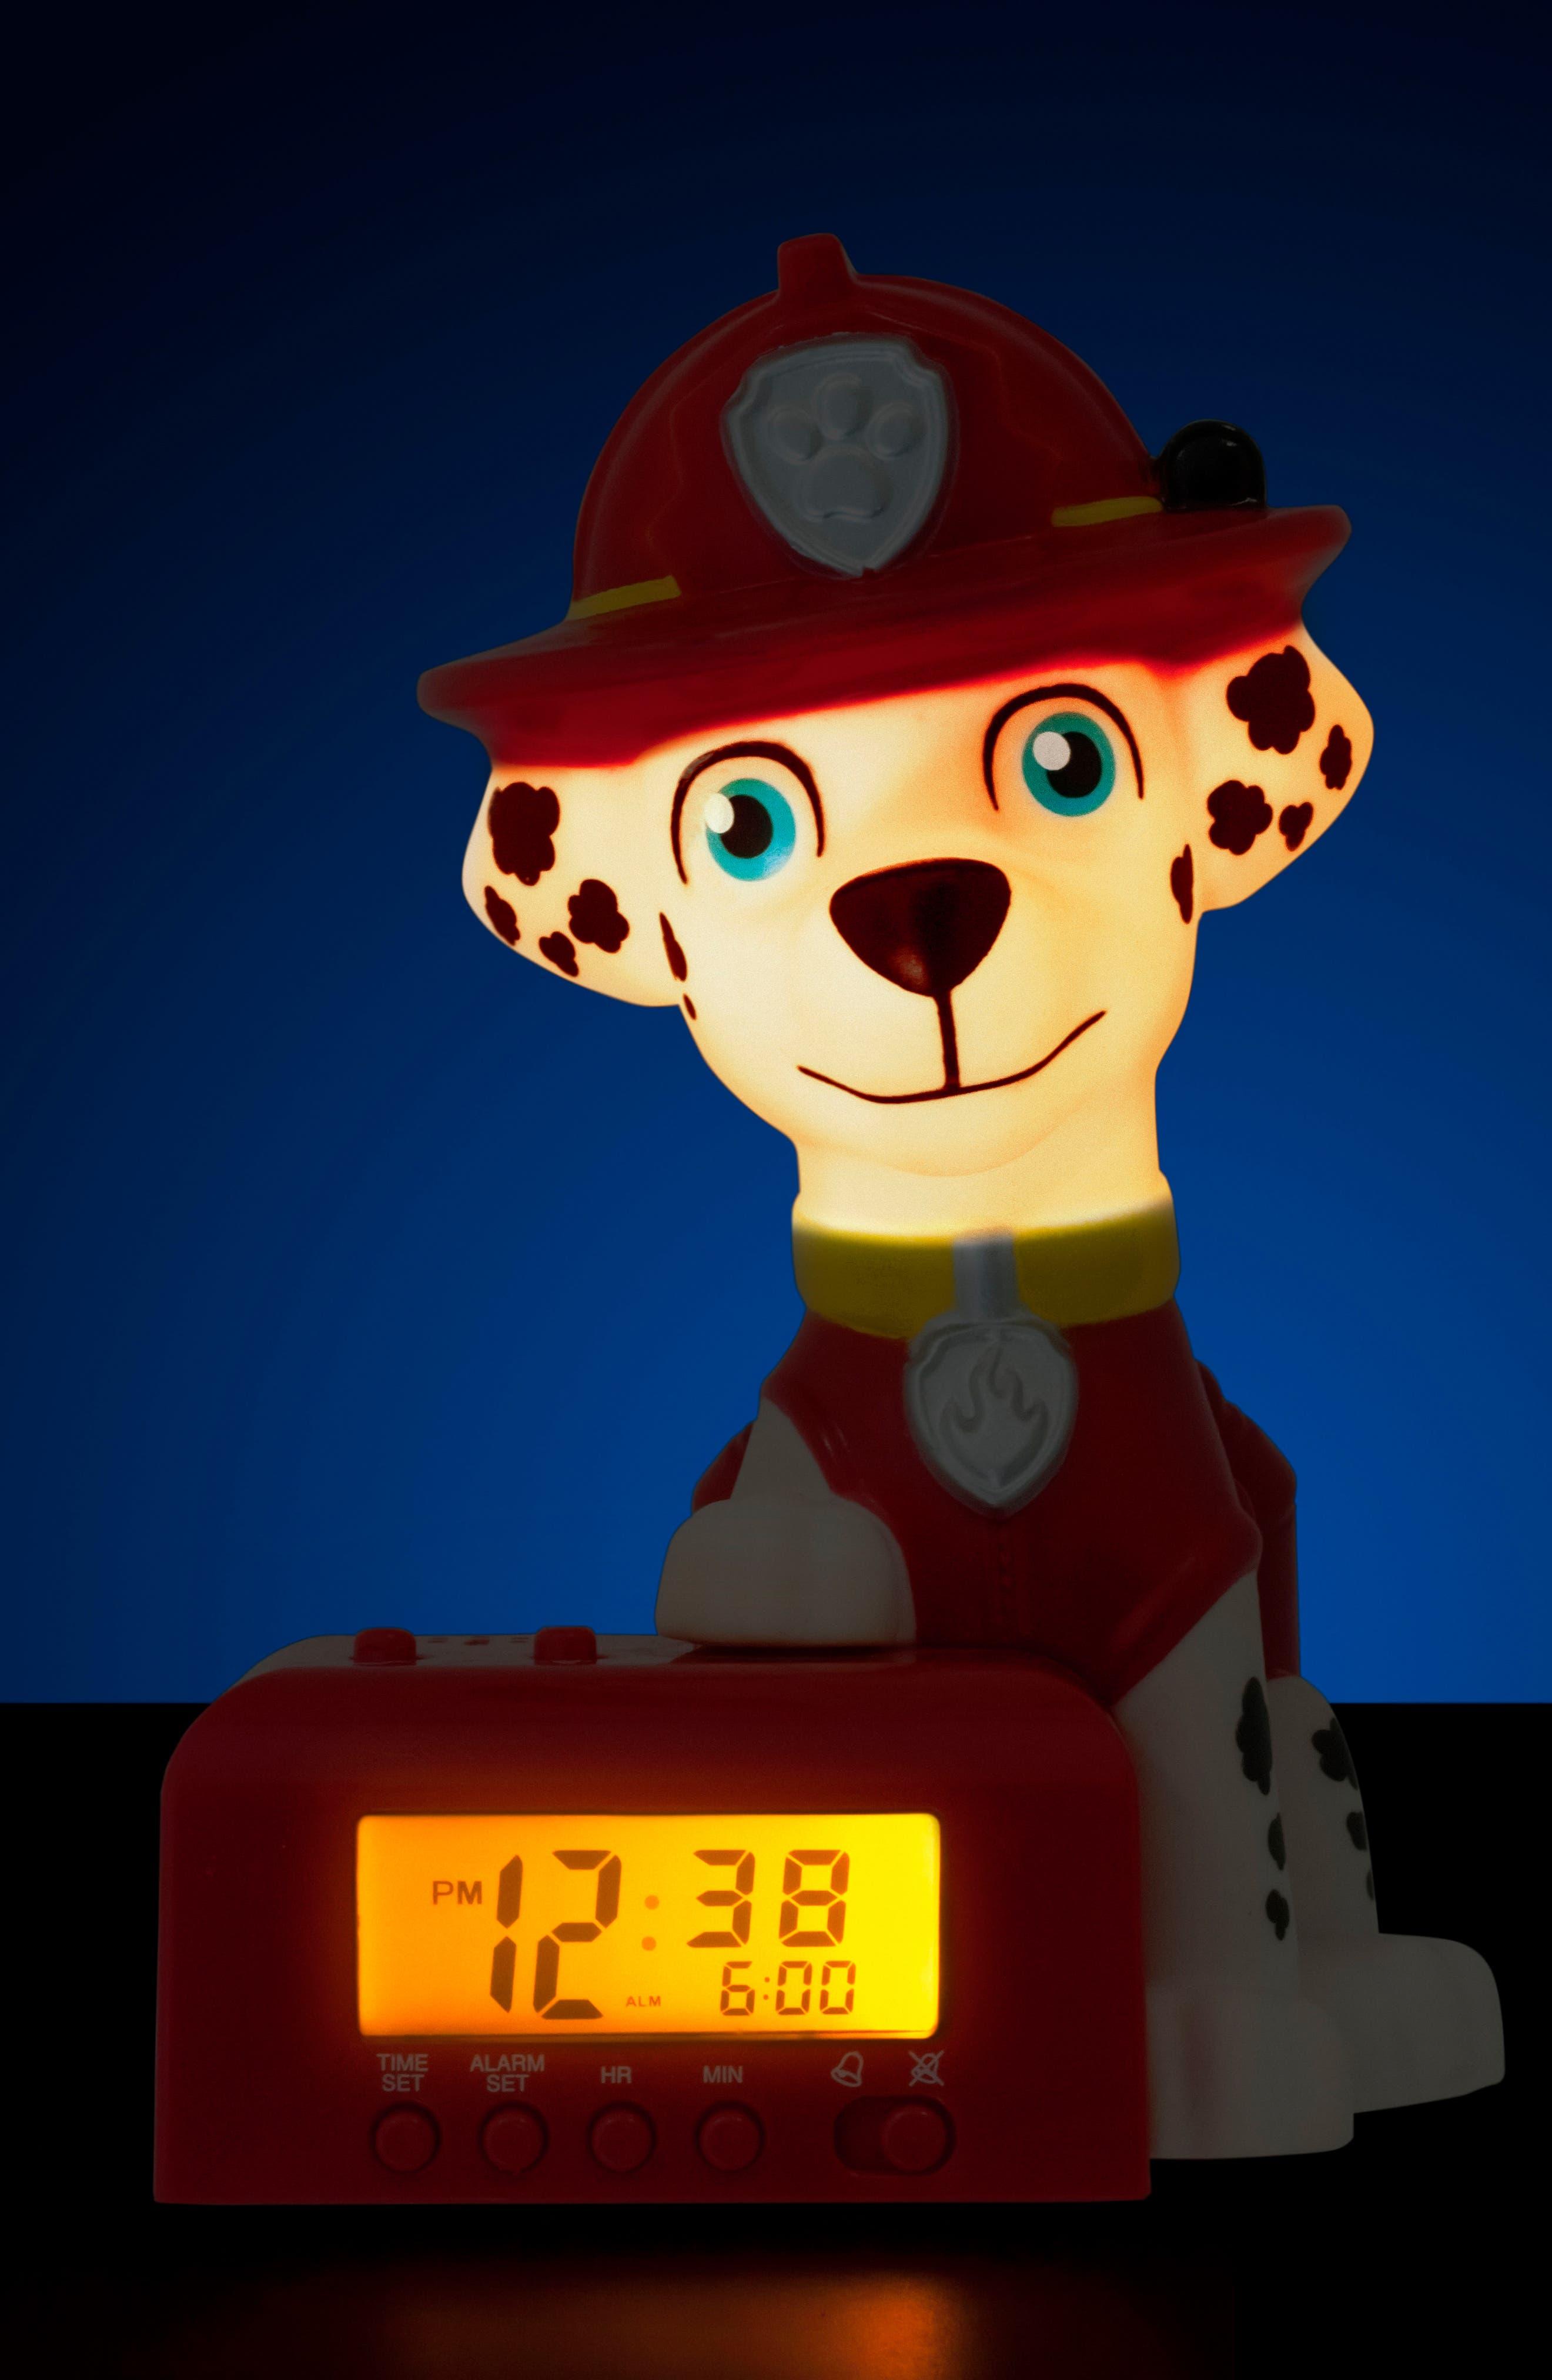 Paw Patrol - Marshall Night-Light/Alarm Clock,                             Alternate thumbnail 3, color,